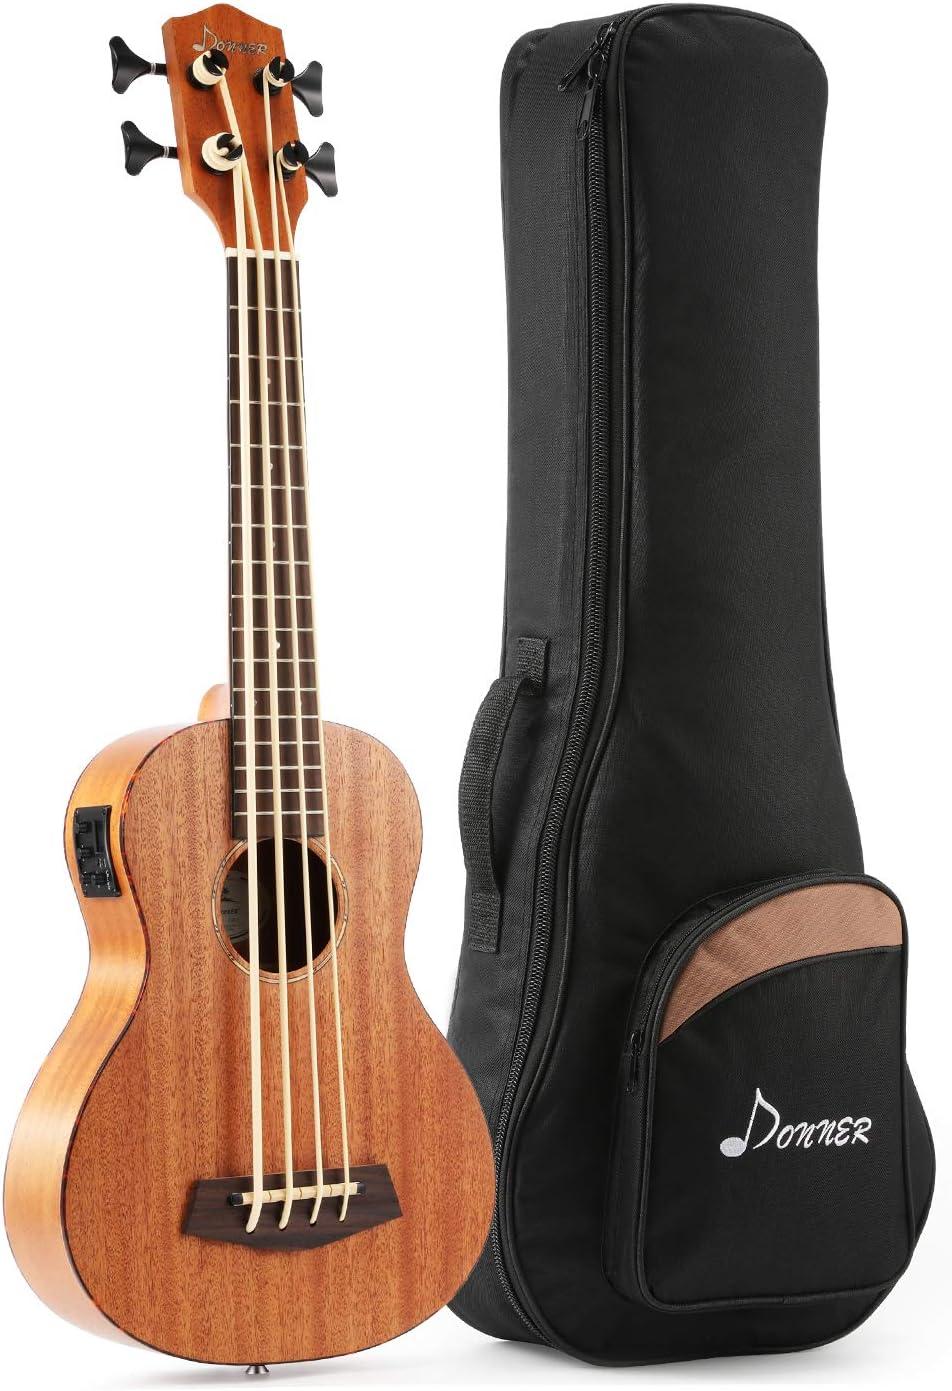 Donner - Ukulele Bass Acústico